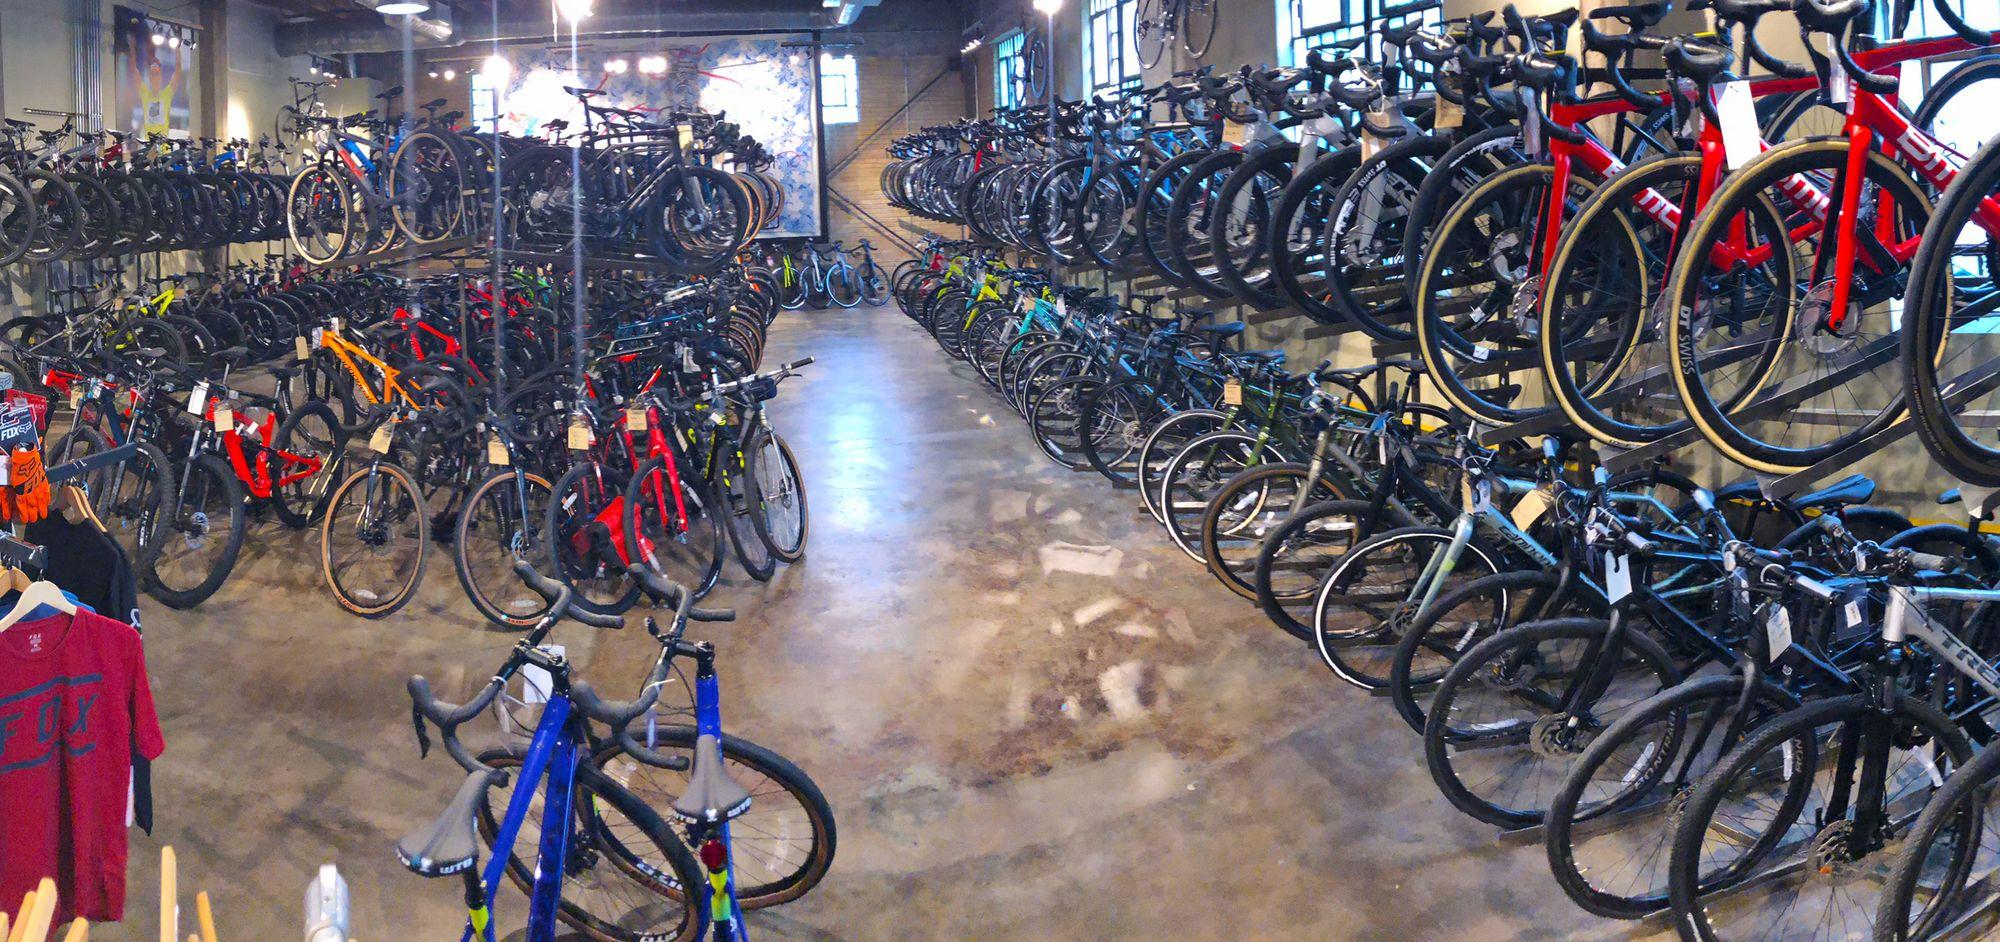 bikes page image.jpg